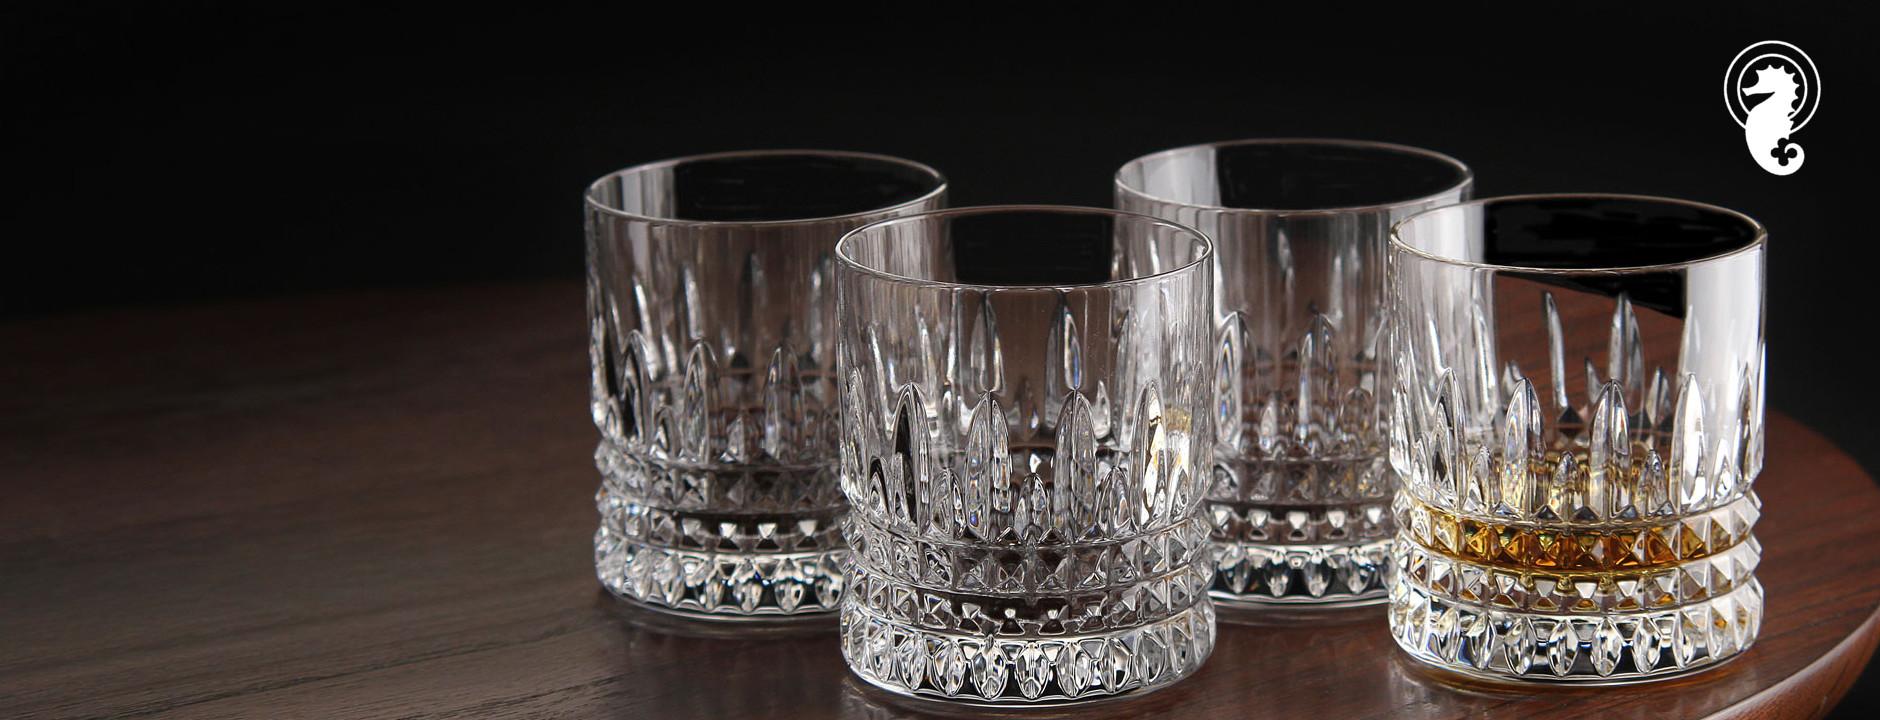 lenox fascination lead crystal vase of dalmazio design inside waterford crystal